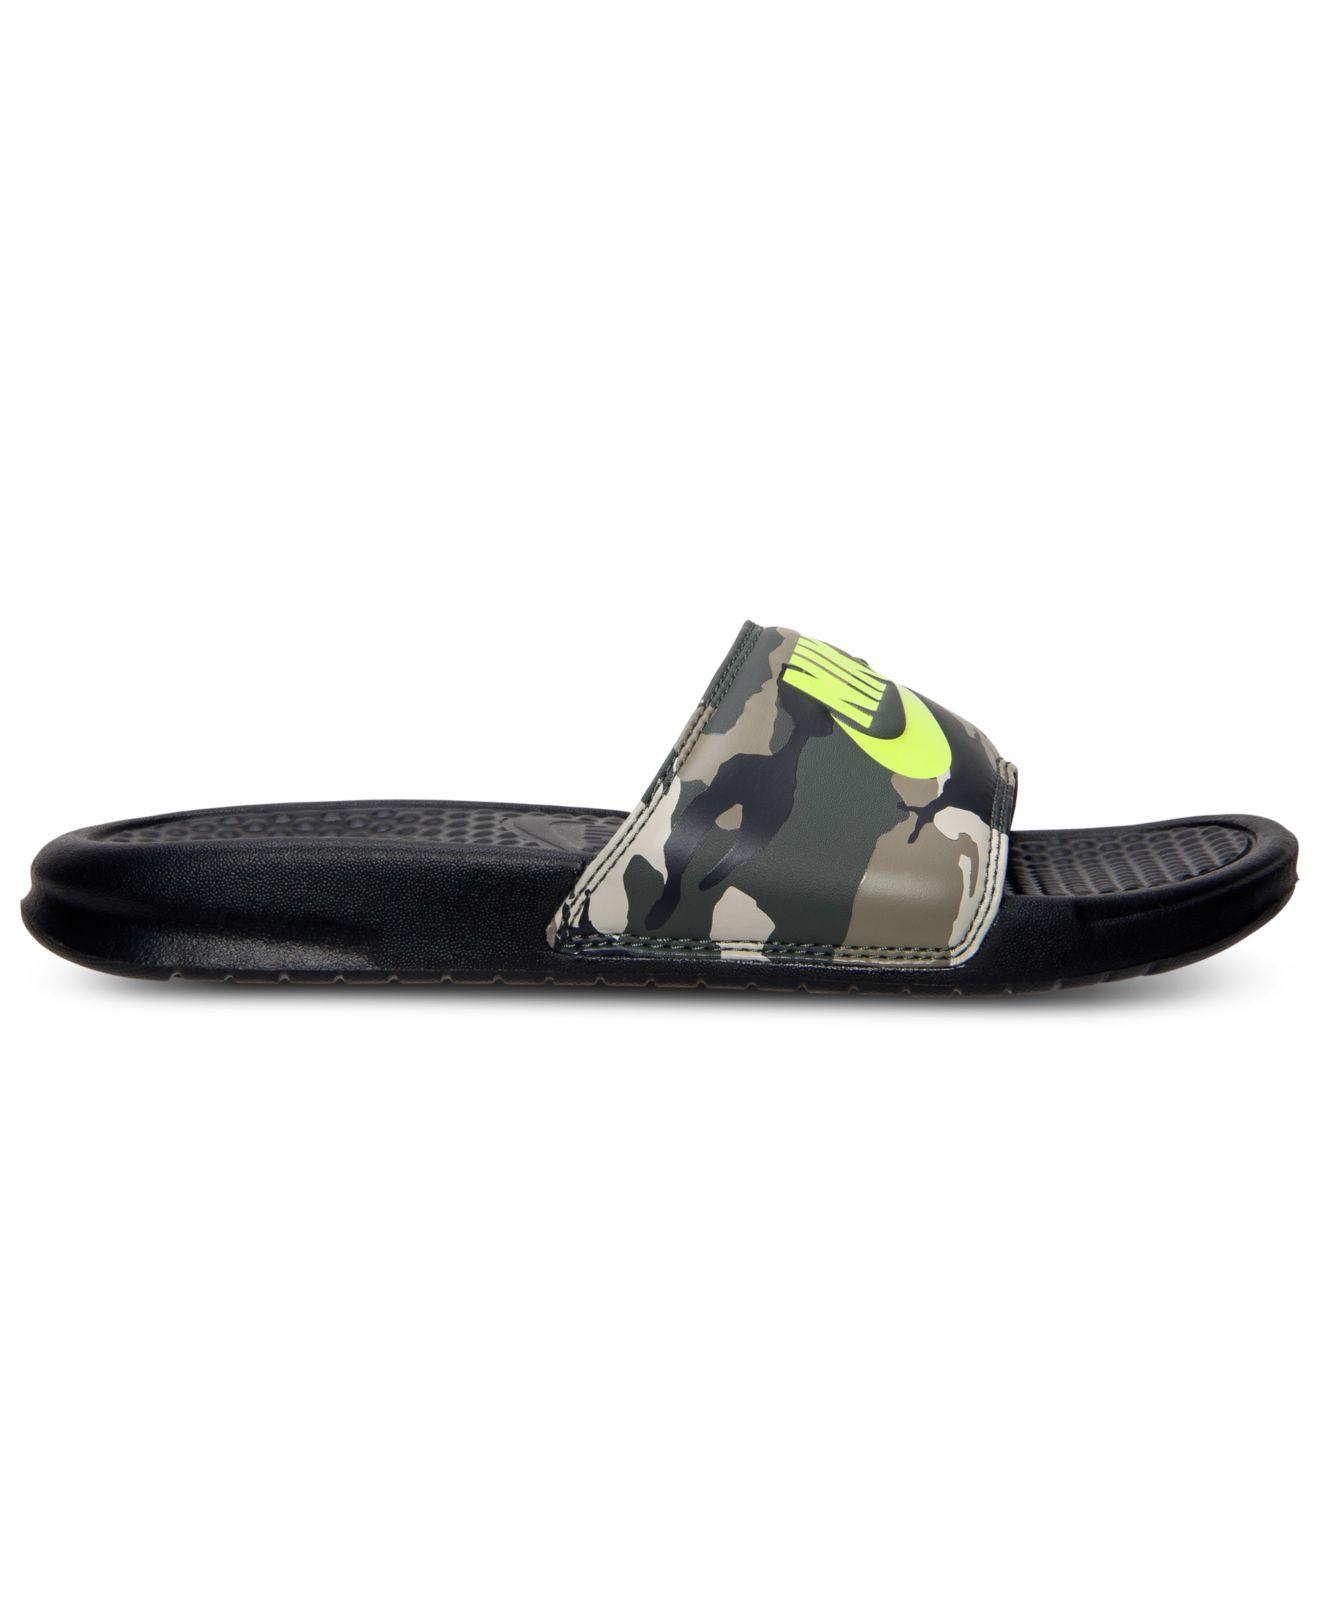 263bae325 ... cheap lyst nike mens benassi jdi print slide sandals from finish line  5c4a1 8652e